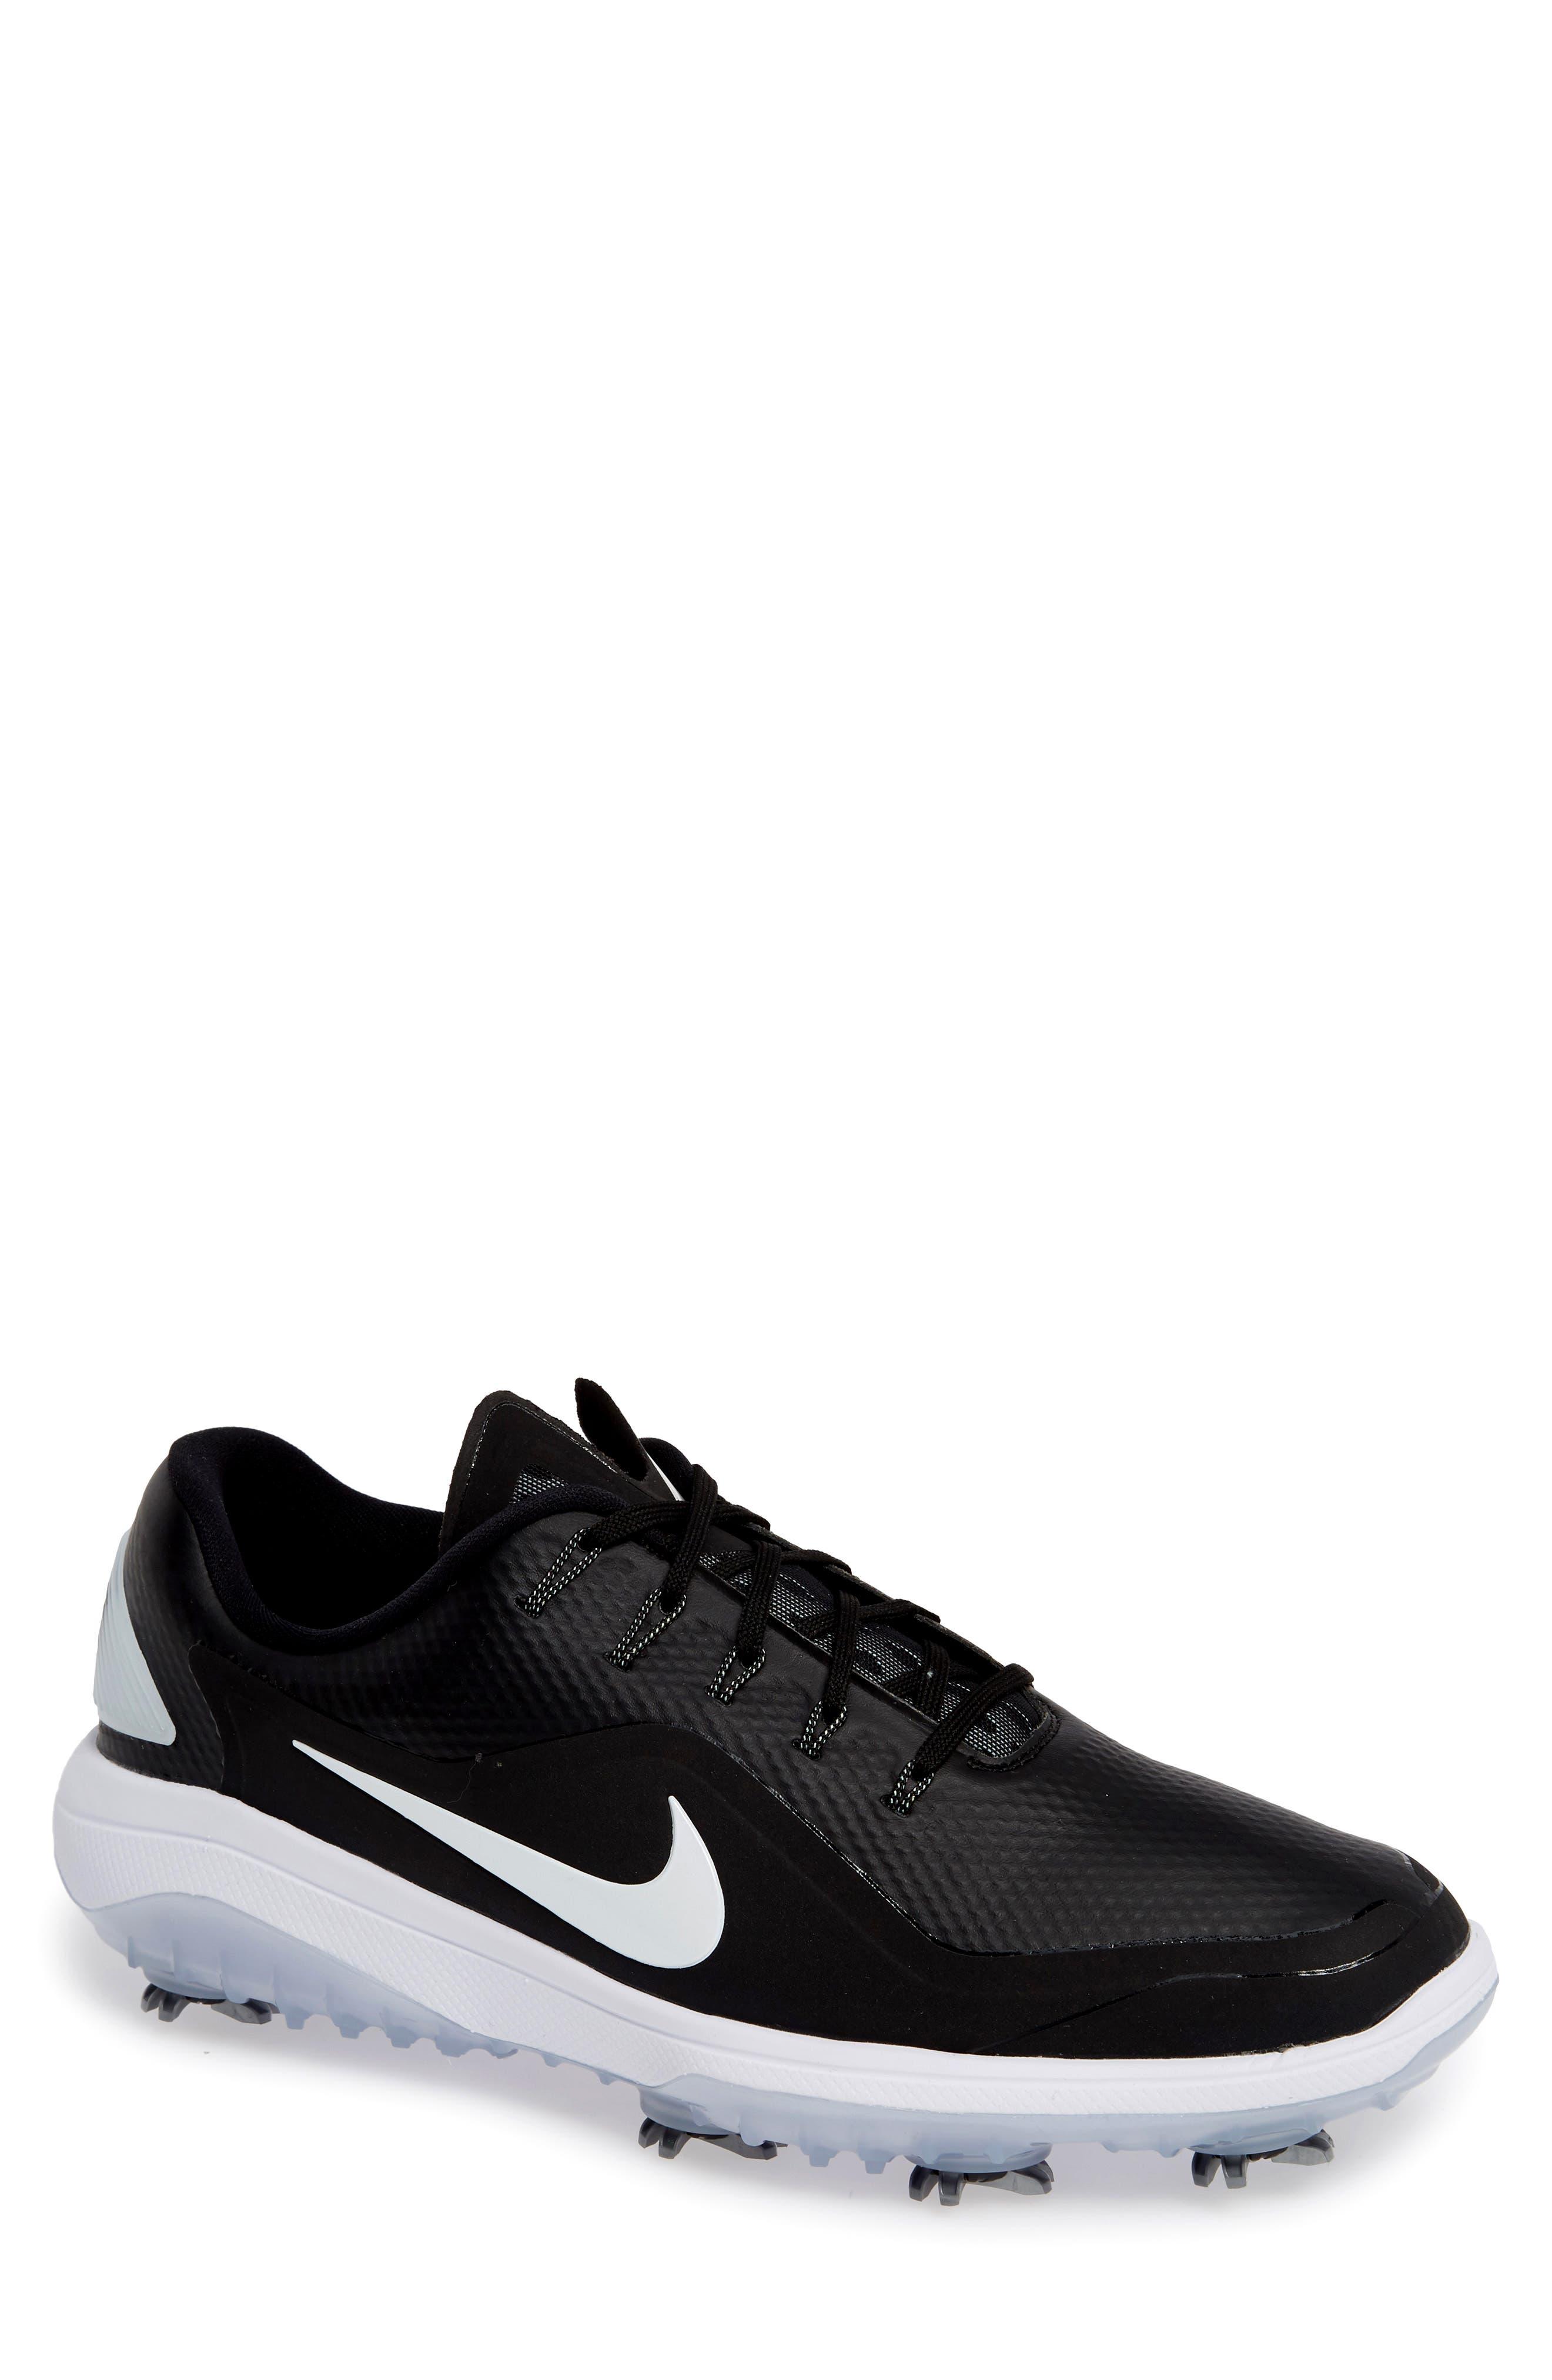 NIKE, React Vapor 2 Golf Shoe, Main thumbnail 1, color, BLACK/ METALLIC WHITE